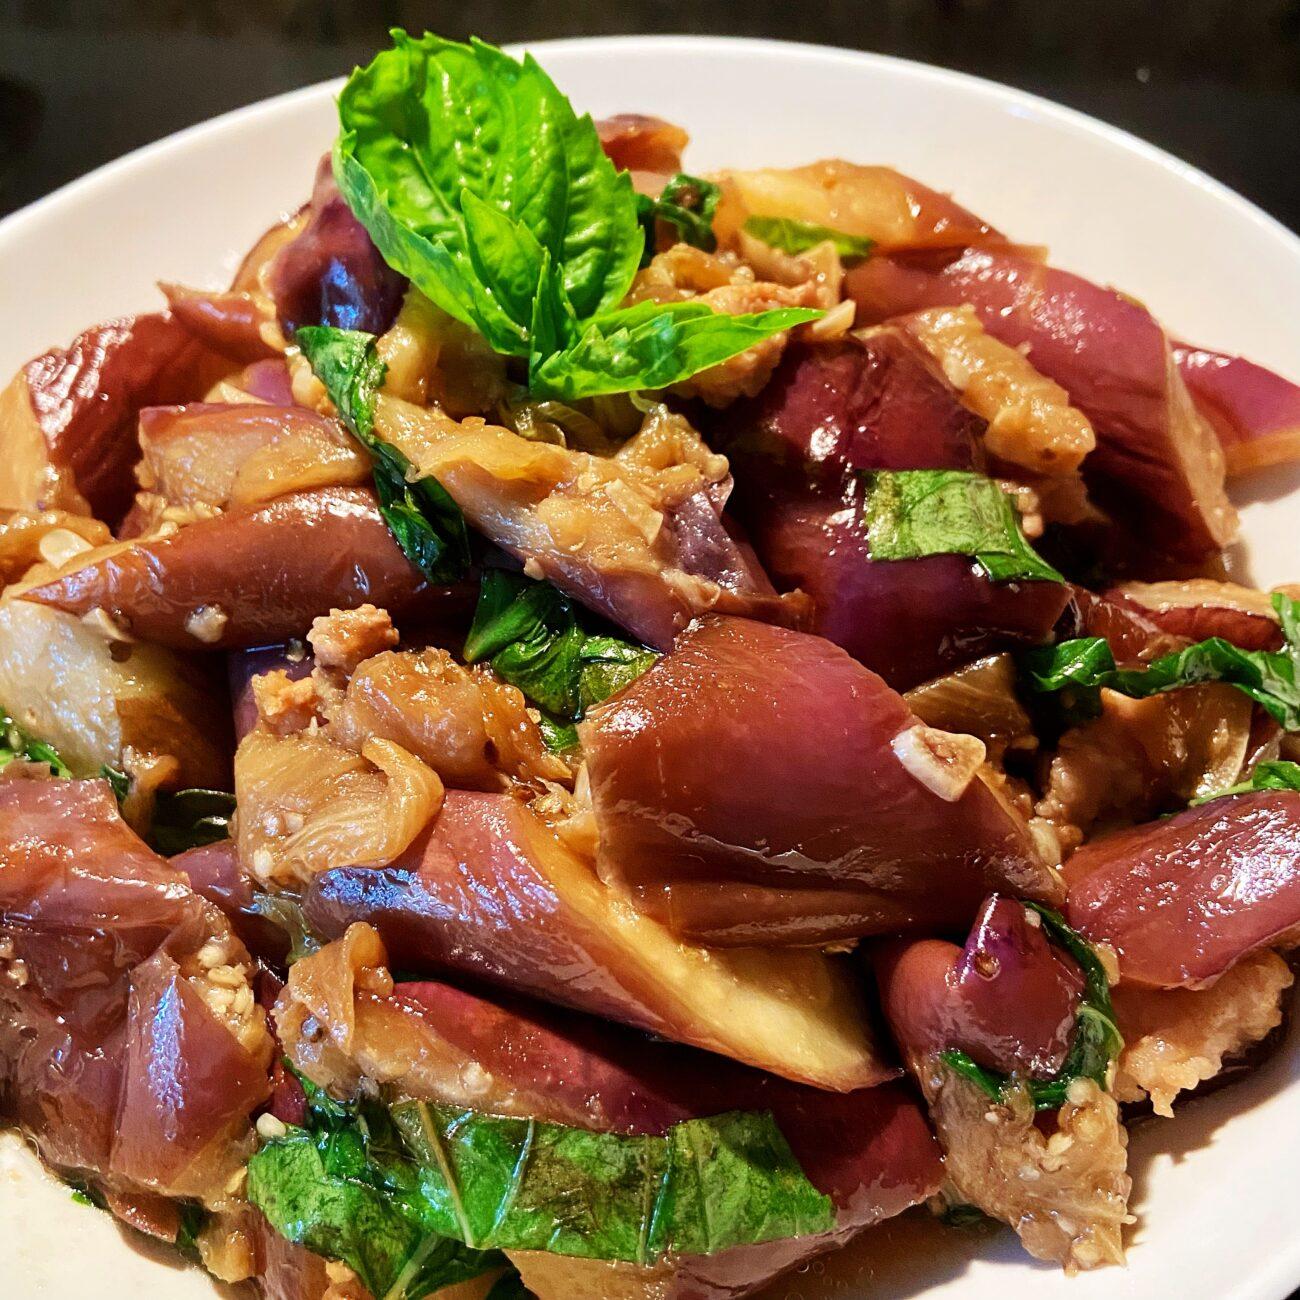 Basil eggplants